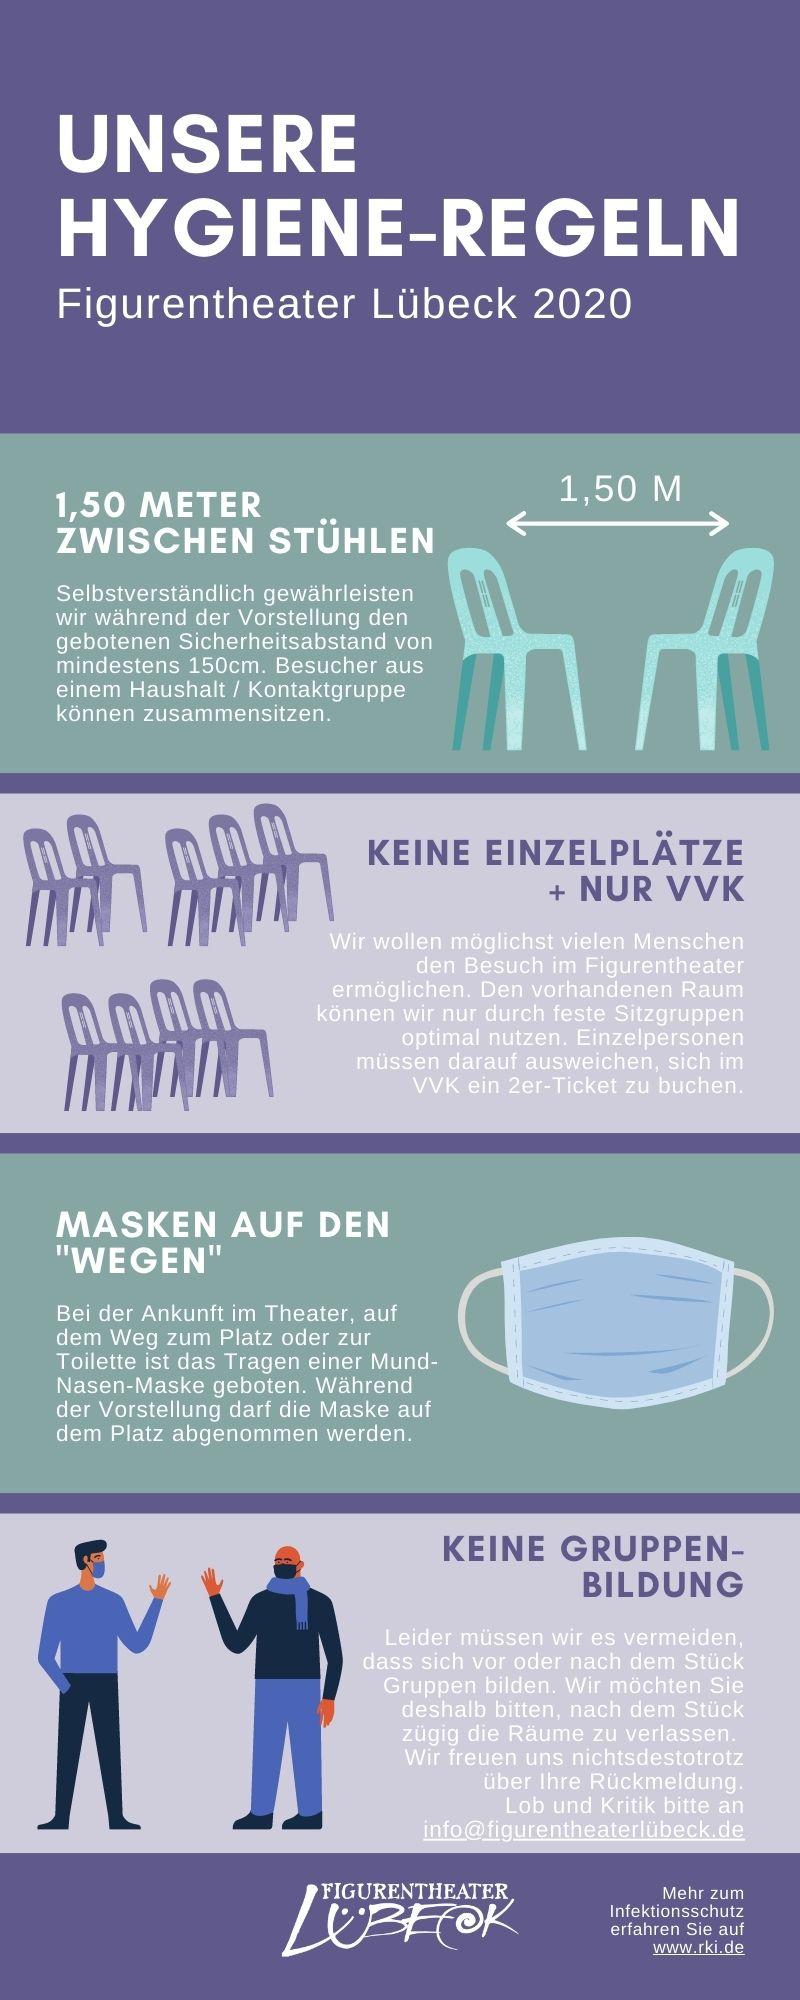 Hygiene-Konzept Figurentheater Lübeck